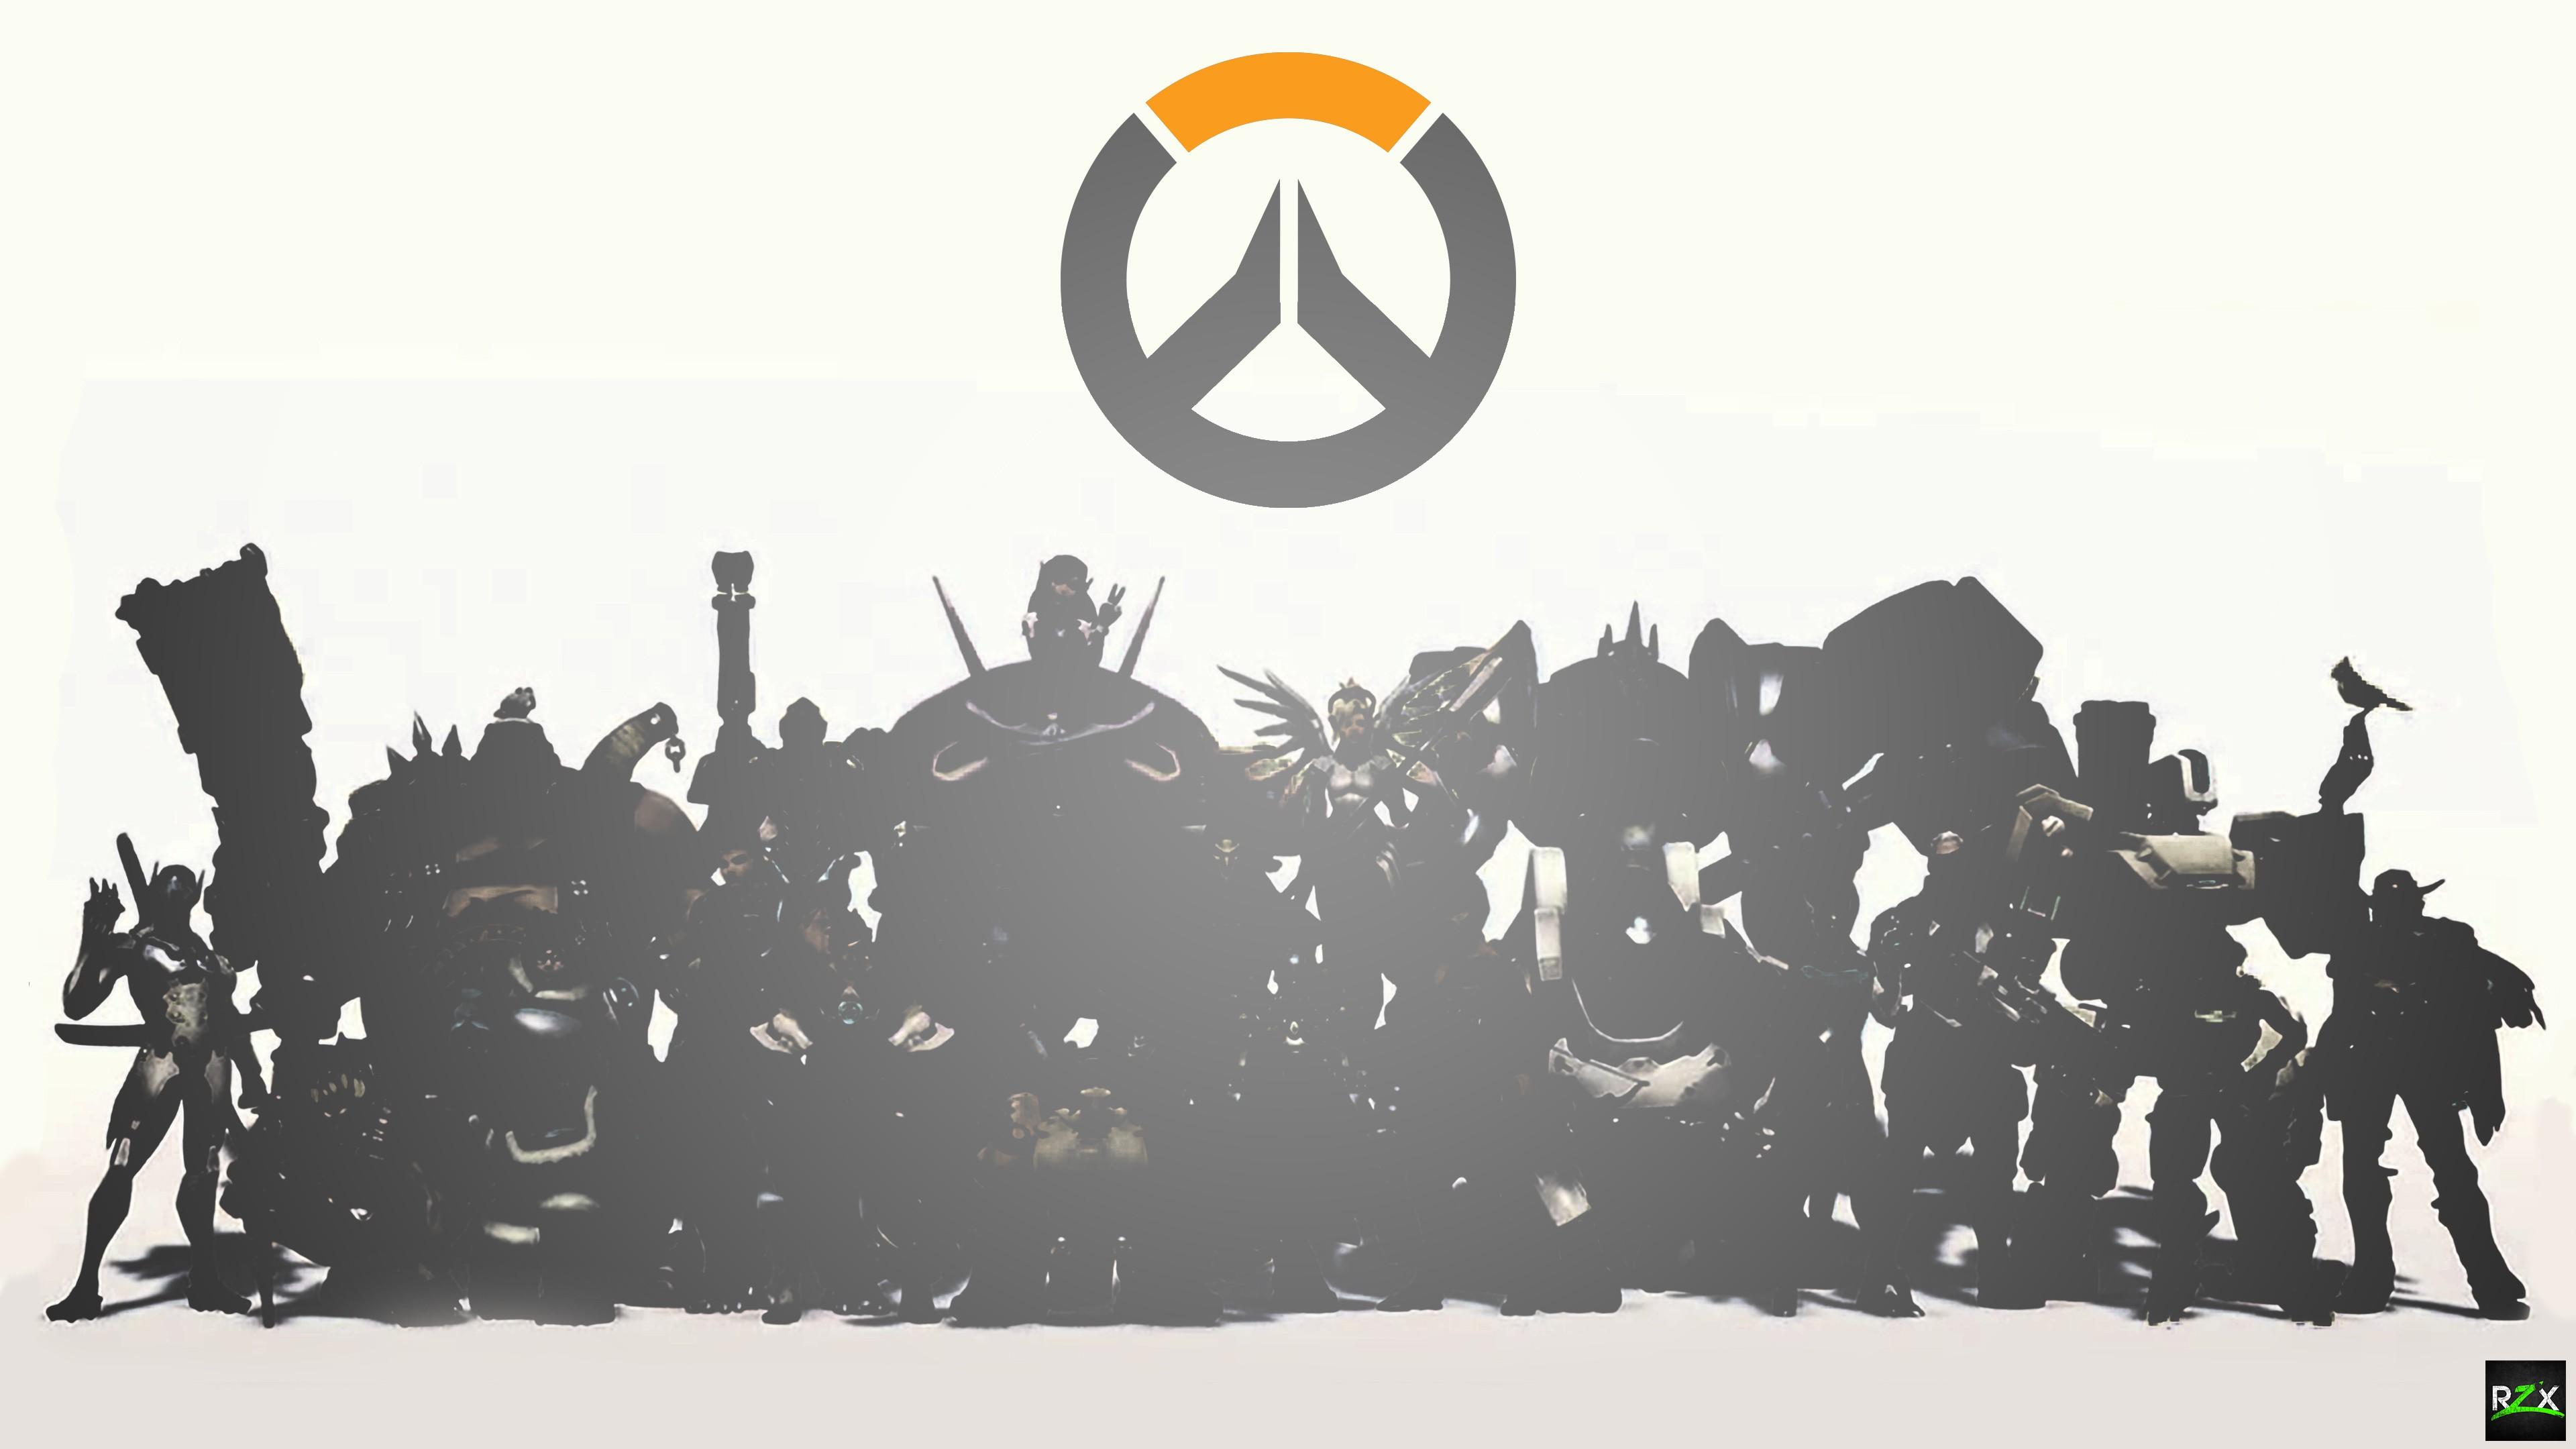 Wallpaper Illustration Video Games Silhouette Logo